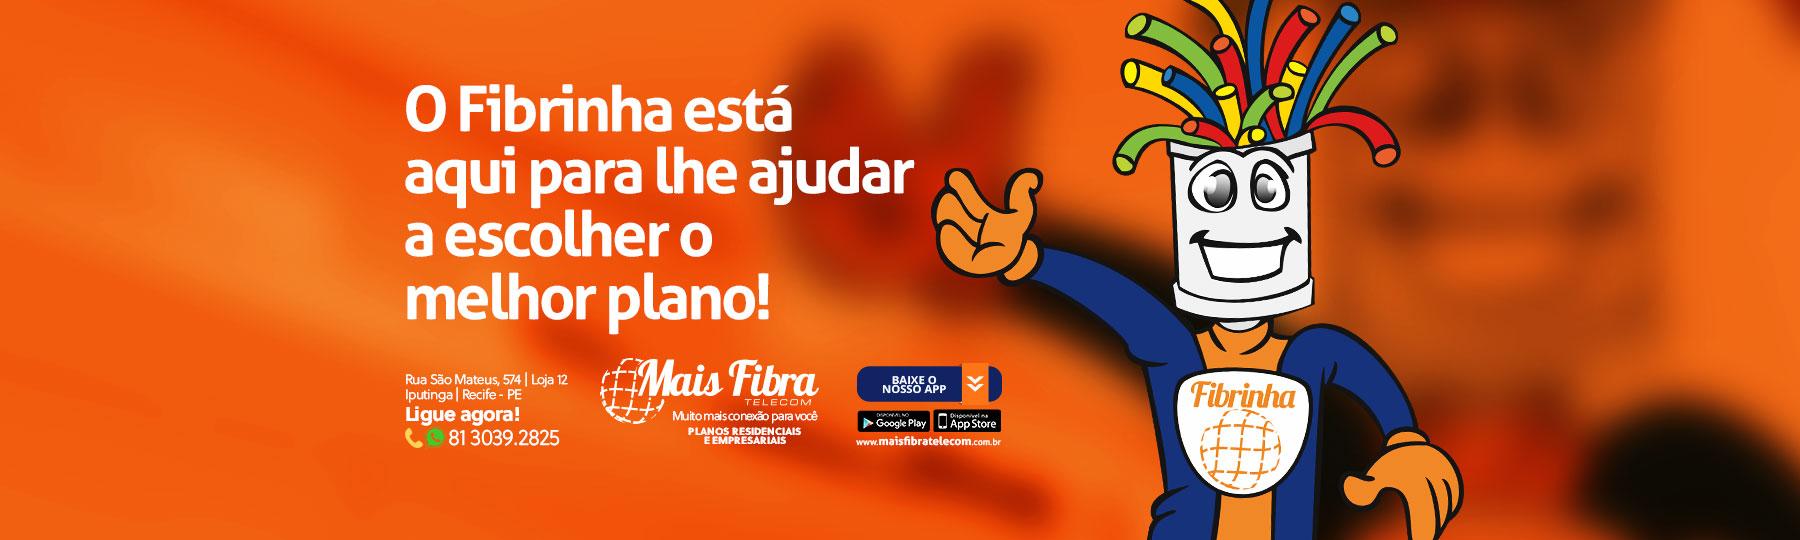 MAIS_FIBRA_BANNER_GIRATORIO_SITE_05